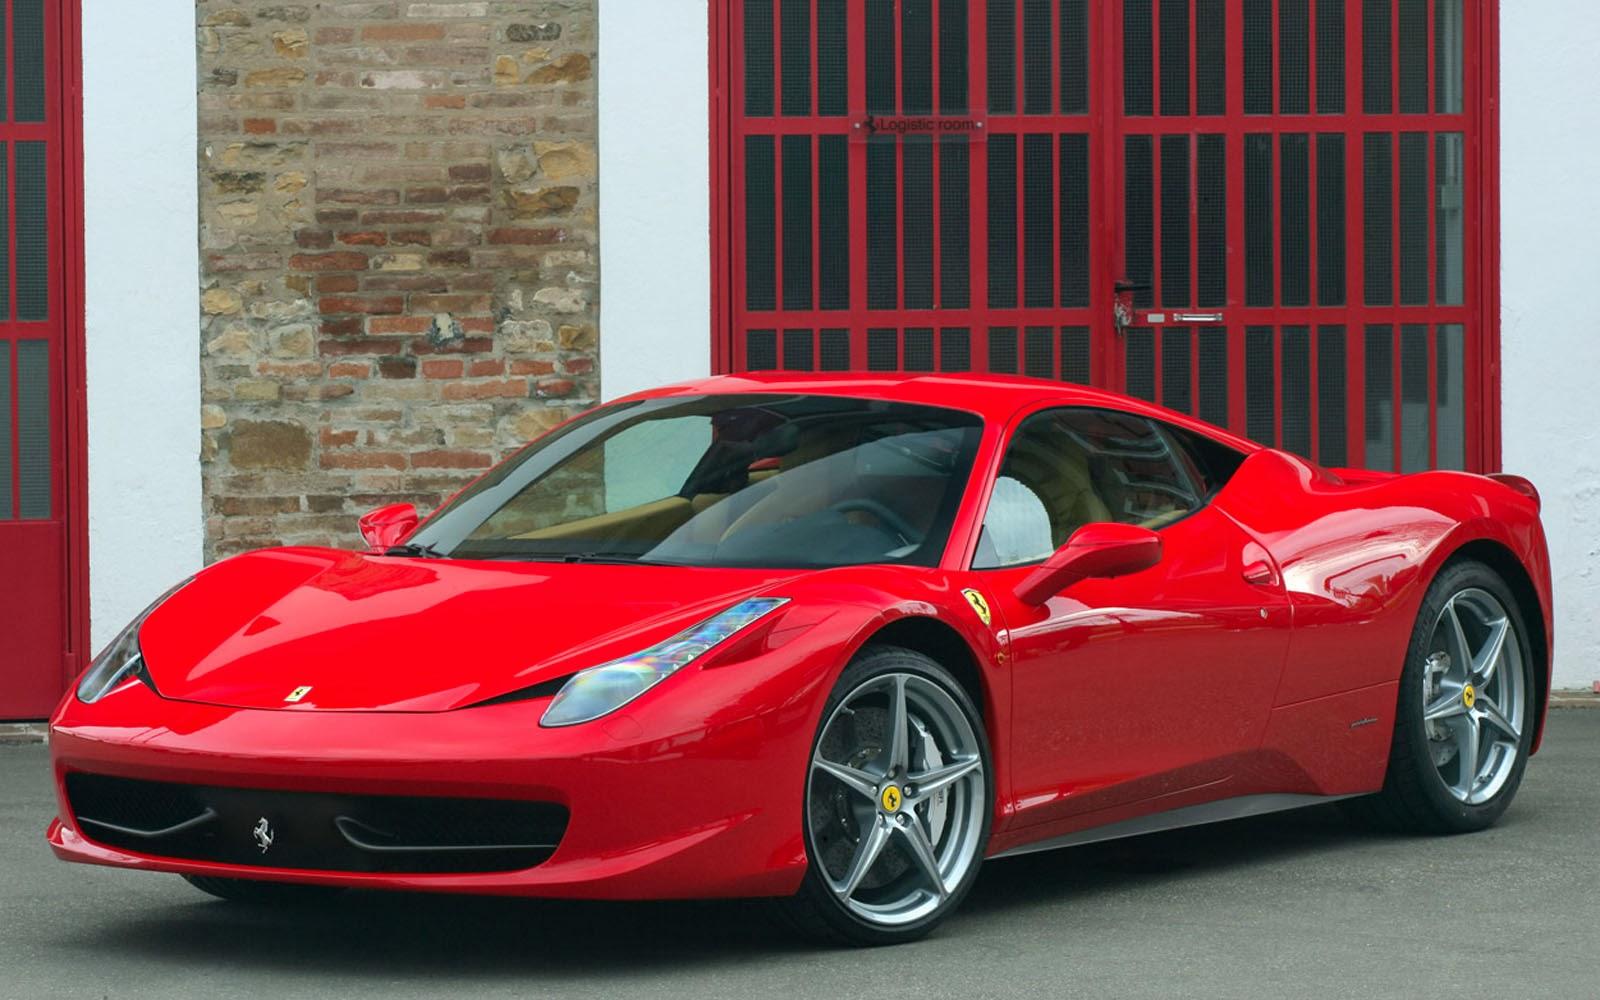 Ferrari 458 Italia Car Wallpapers - 3D HD Wallpapers